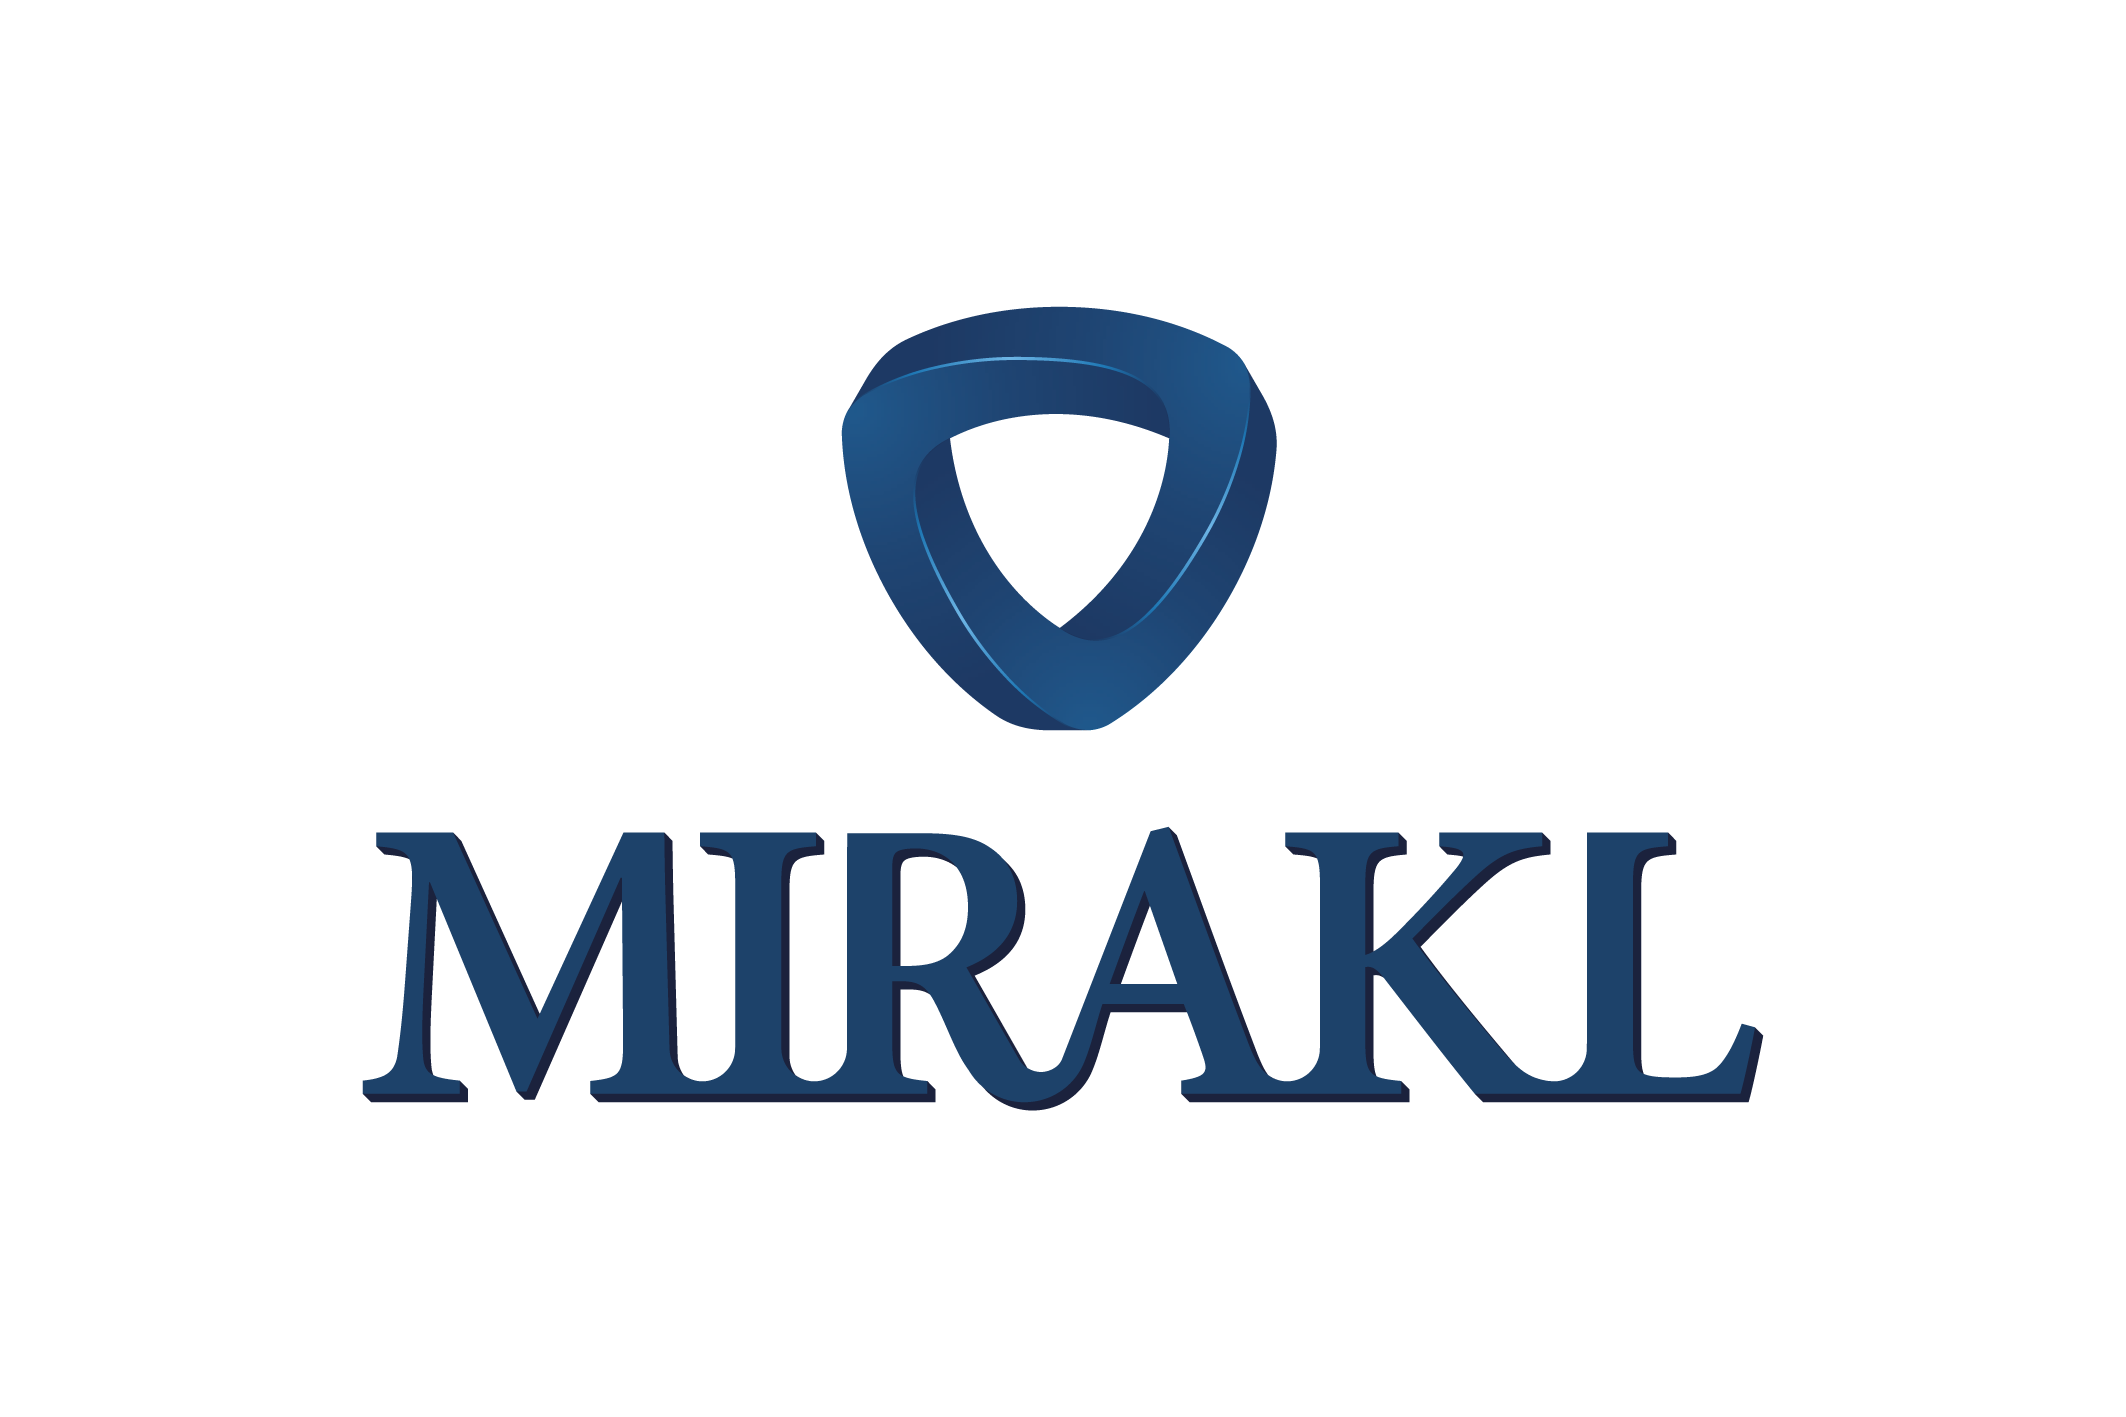 Marakl ecommerce integration with XPS Ship.